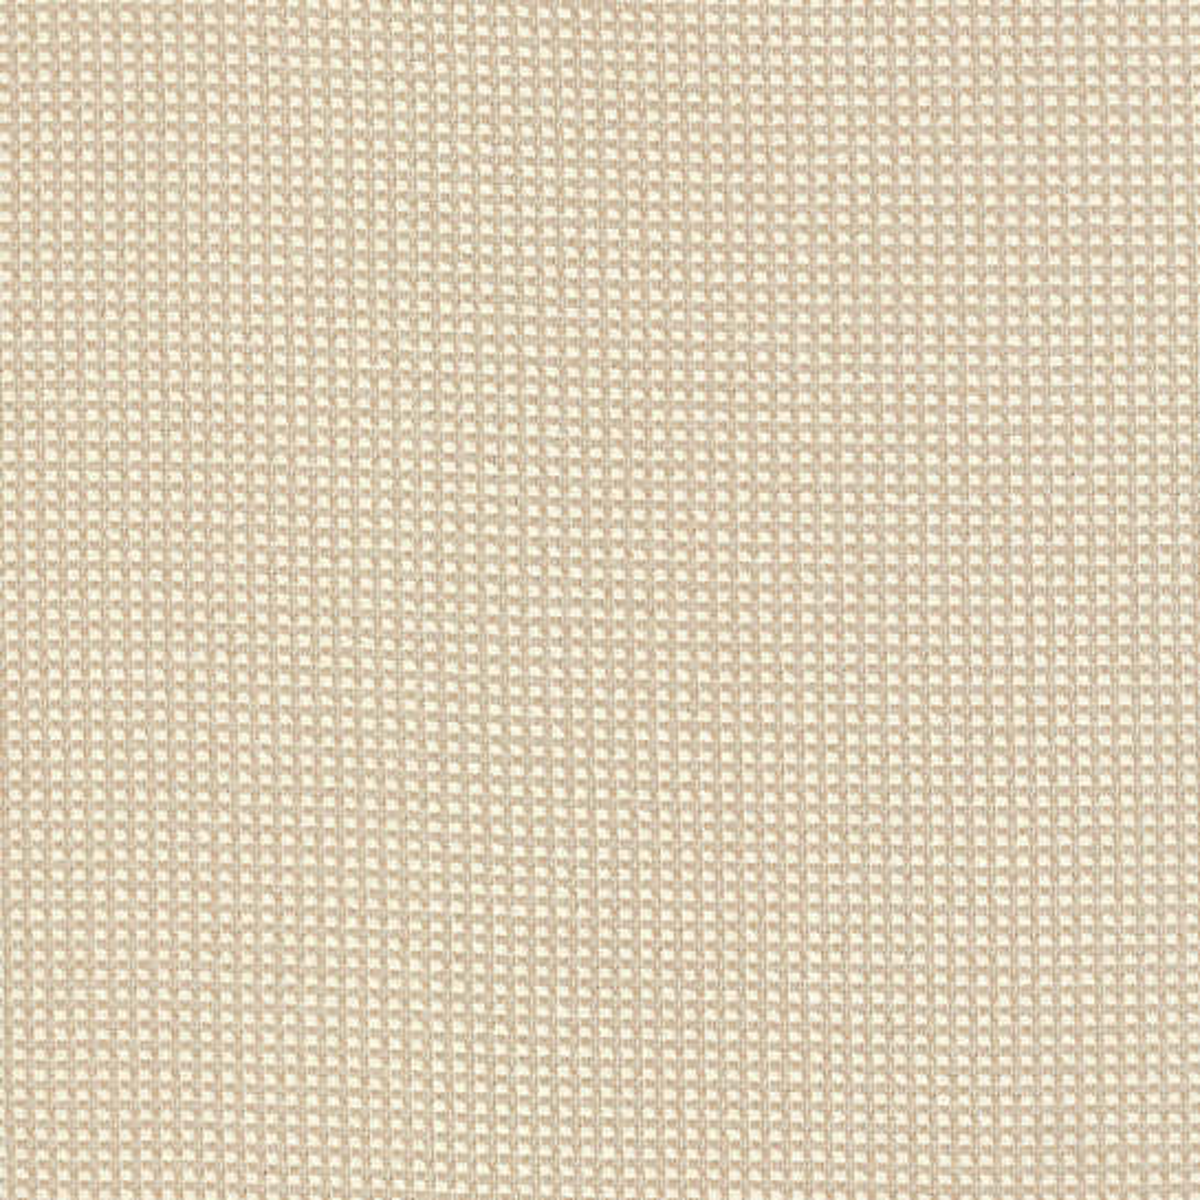 Checkered Cream/Natural  Swatch